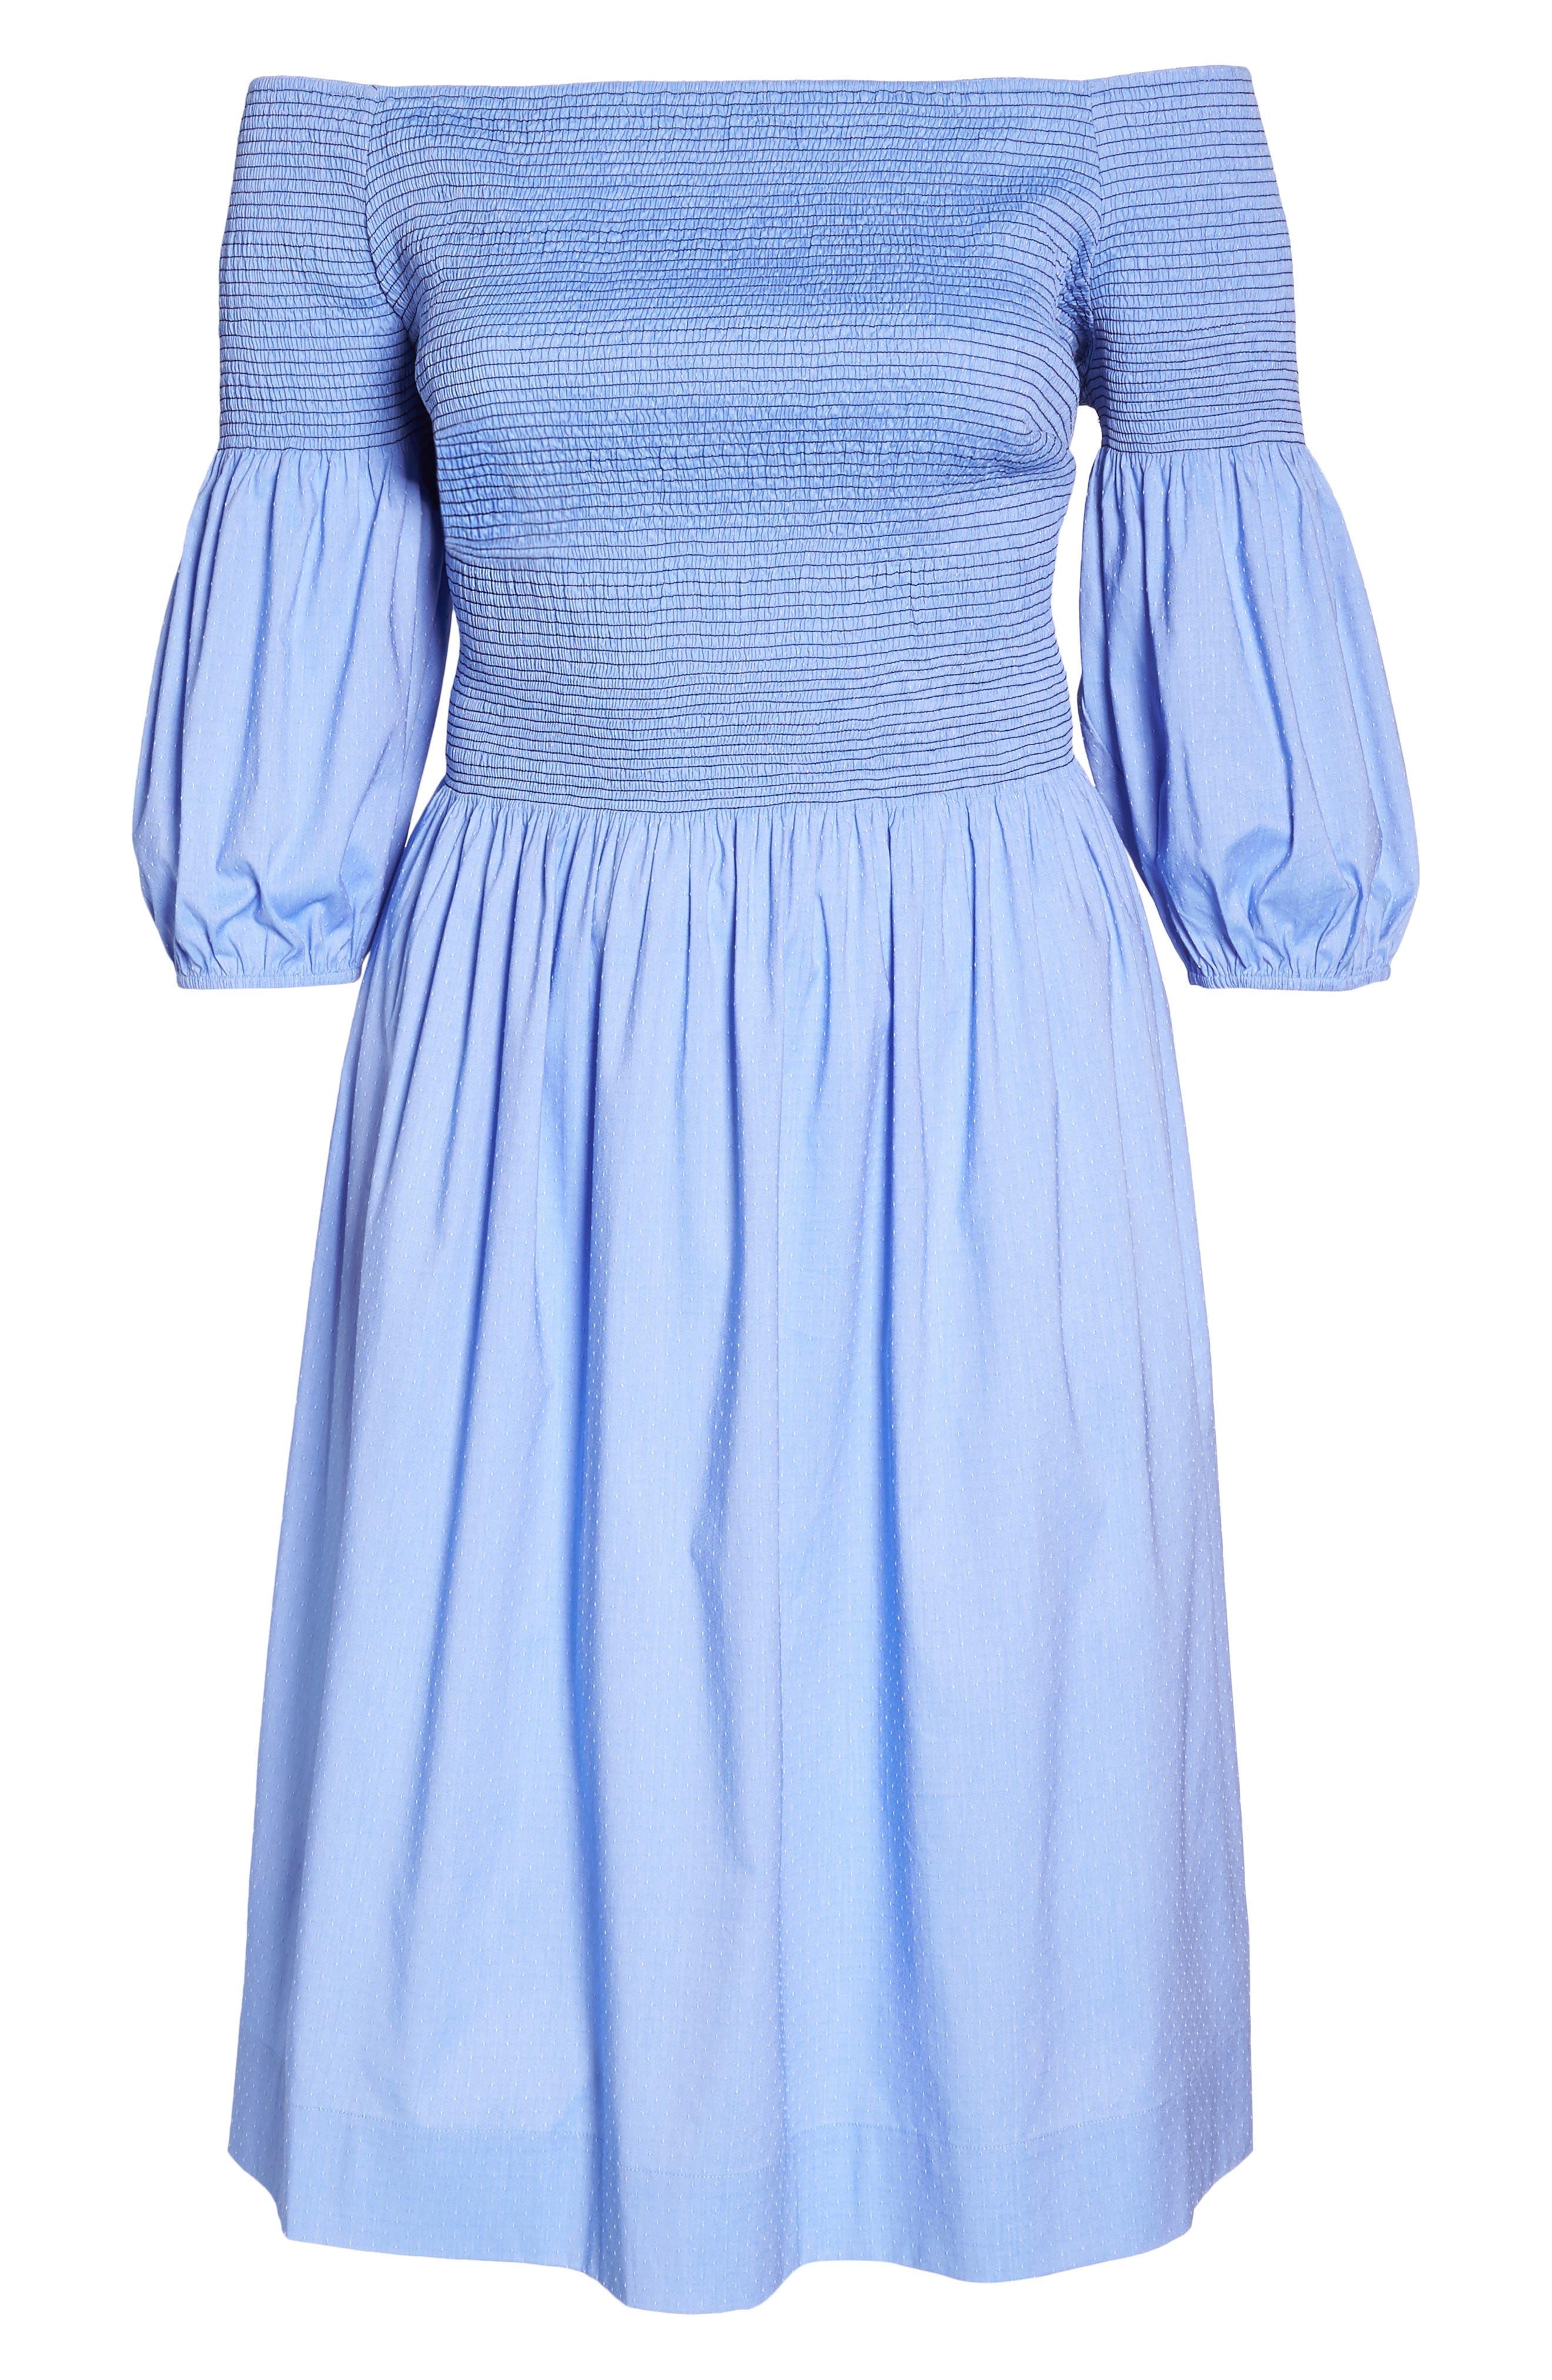 Off the Shoulder Smocked Bodice Midi Dress,                             Alternate thumbnail 7, color,                             Blue Ivory Swiss Dot